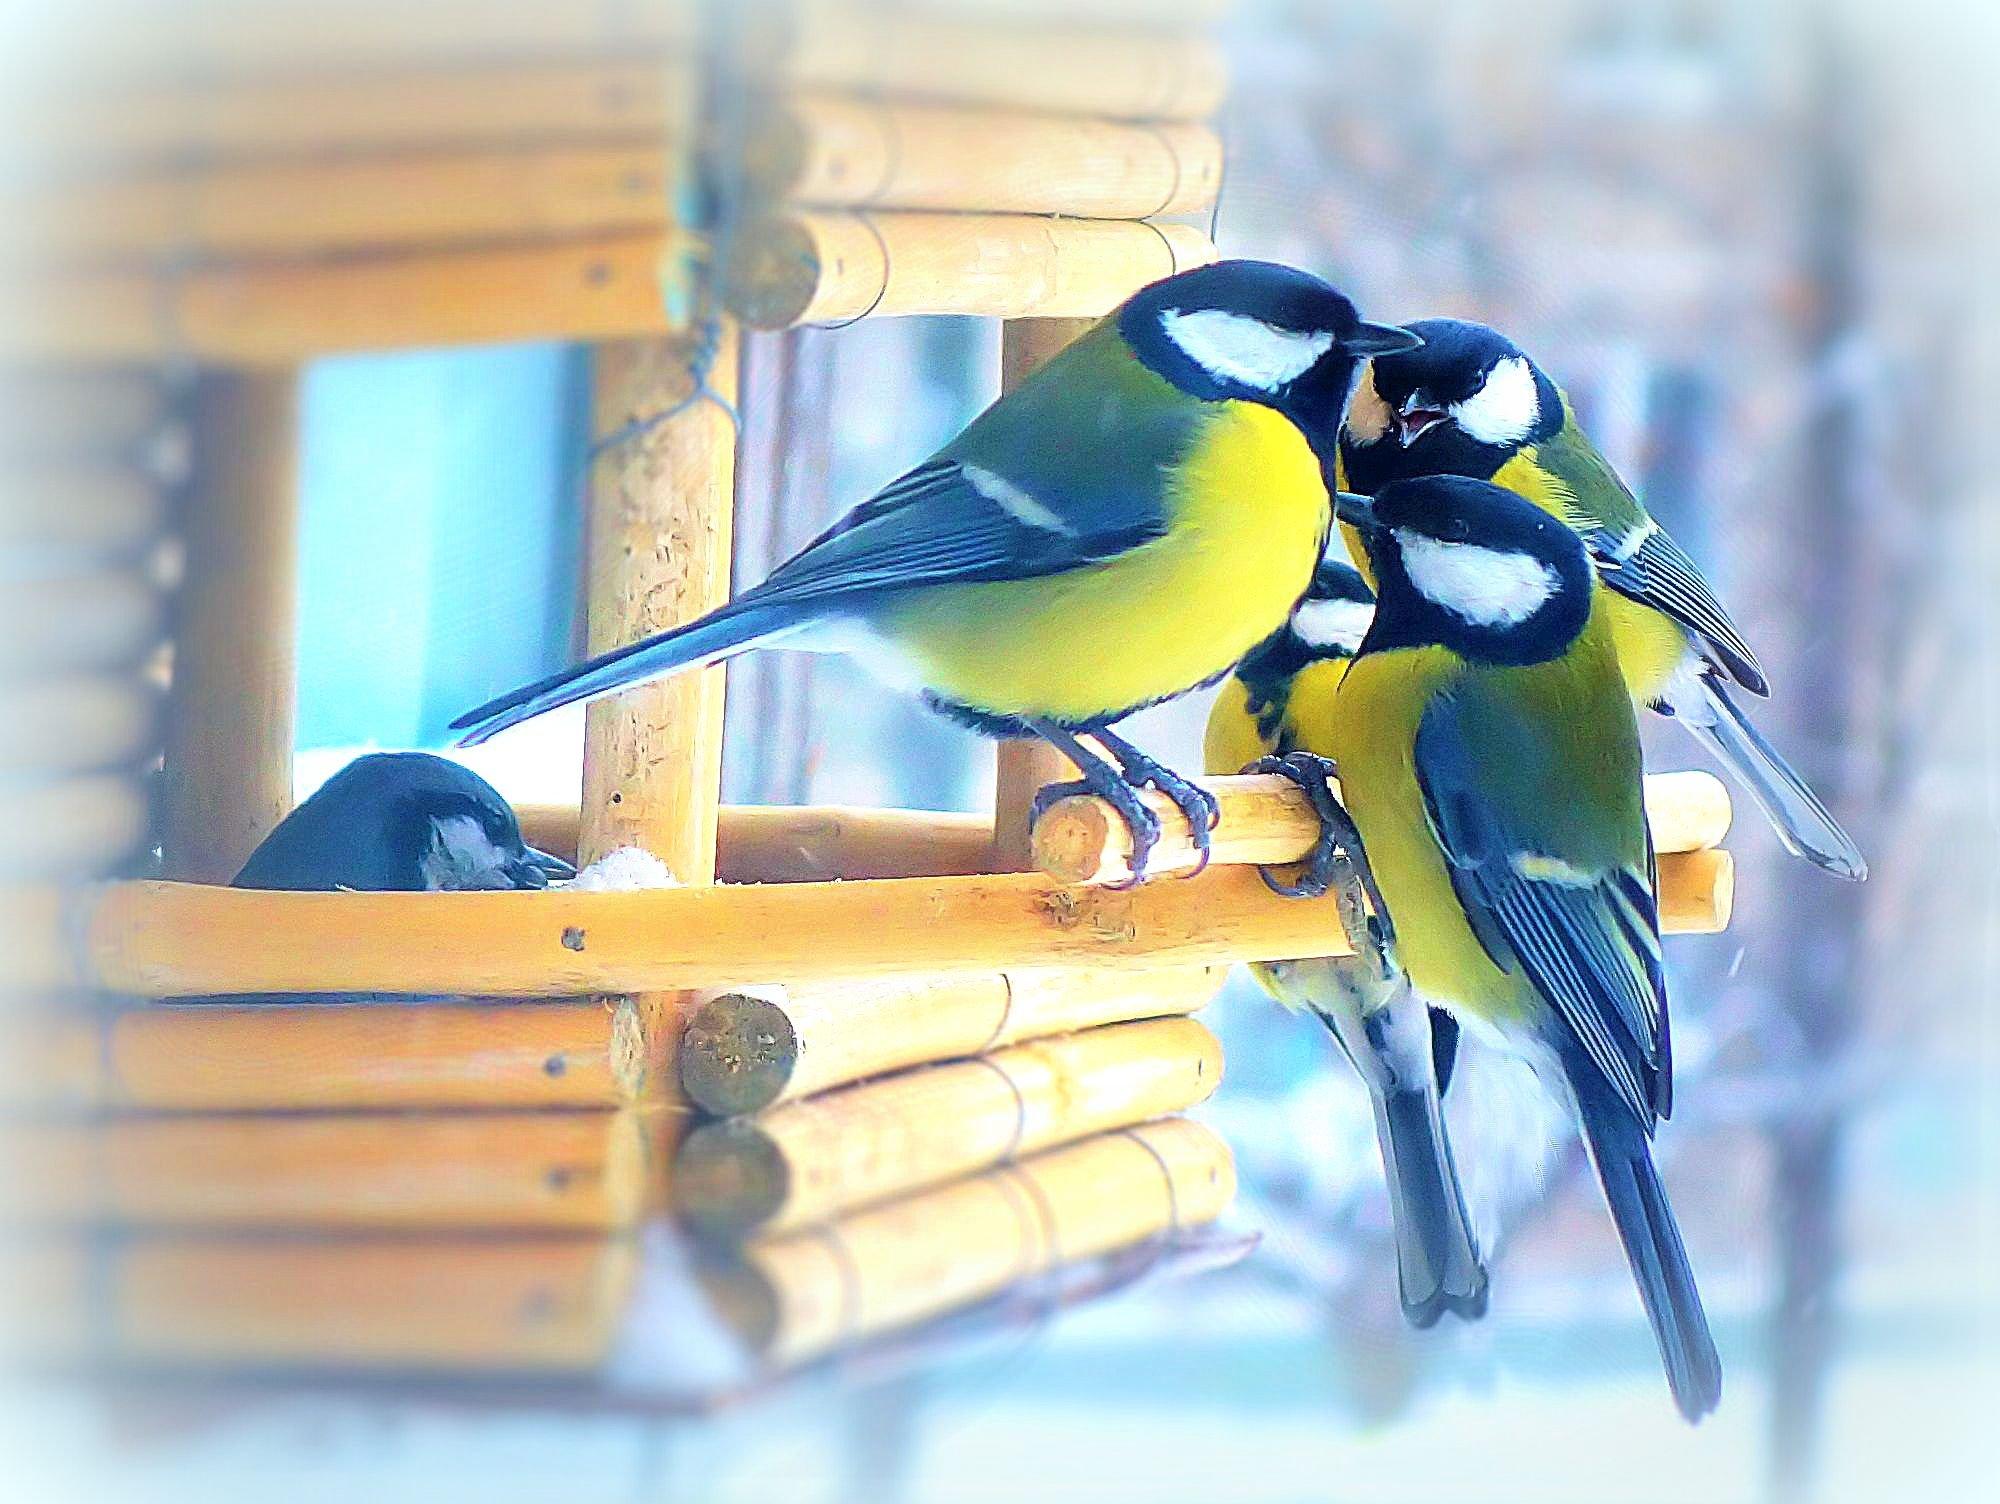 Смотреть фото фотоконкурса птицы на кормушке